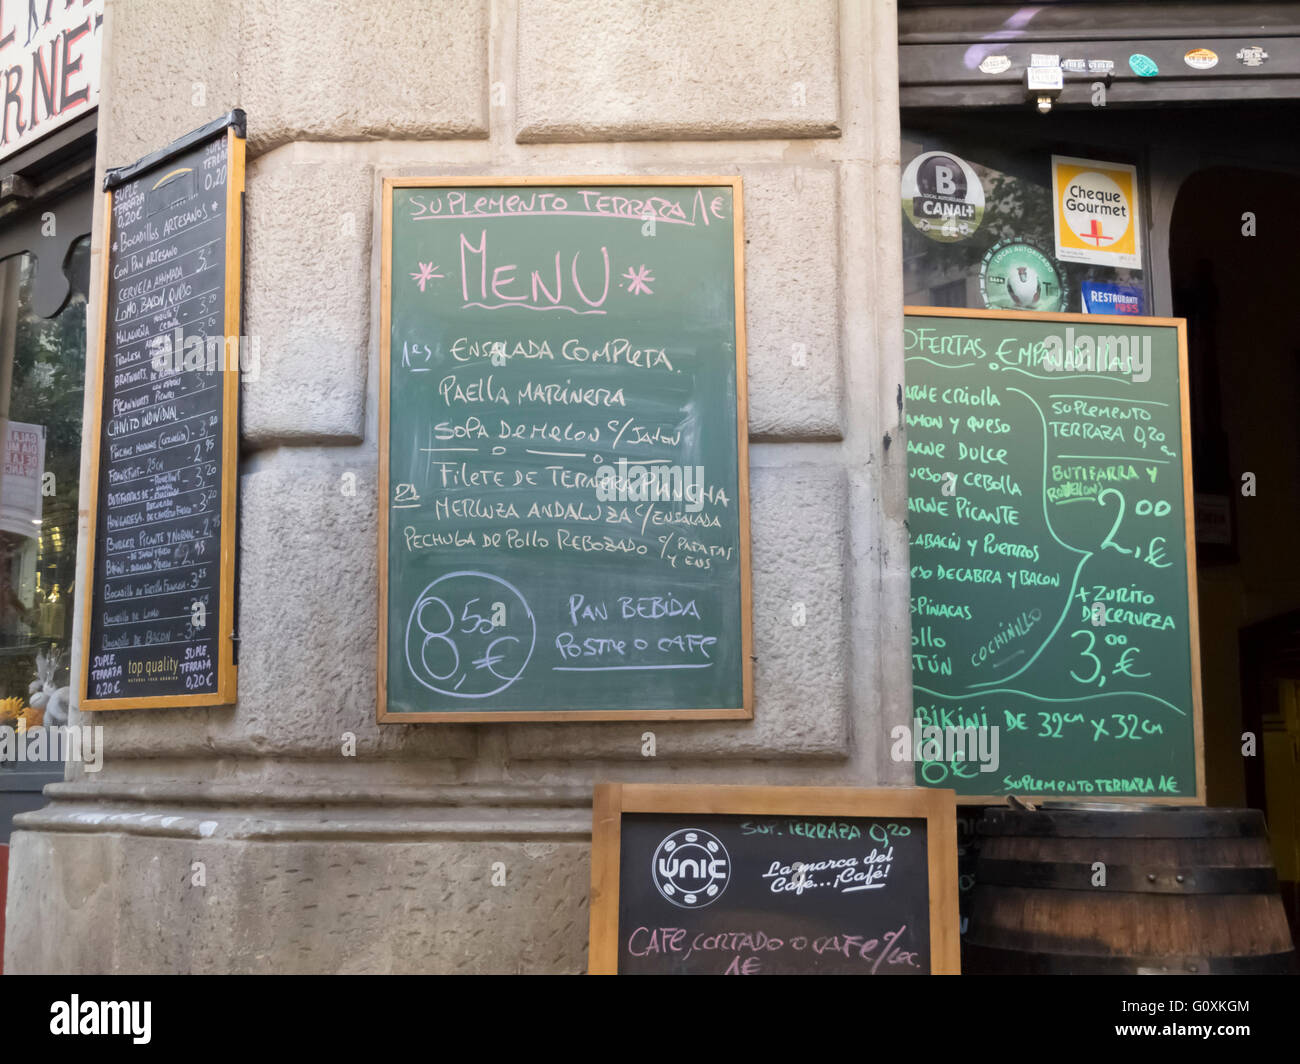 Chalkboard signs outside La Taberneta Cerveseria Spanish bar, Barcelona, Spain - Stock Image